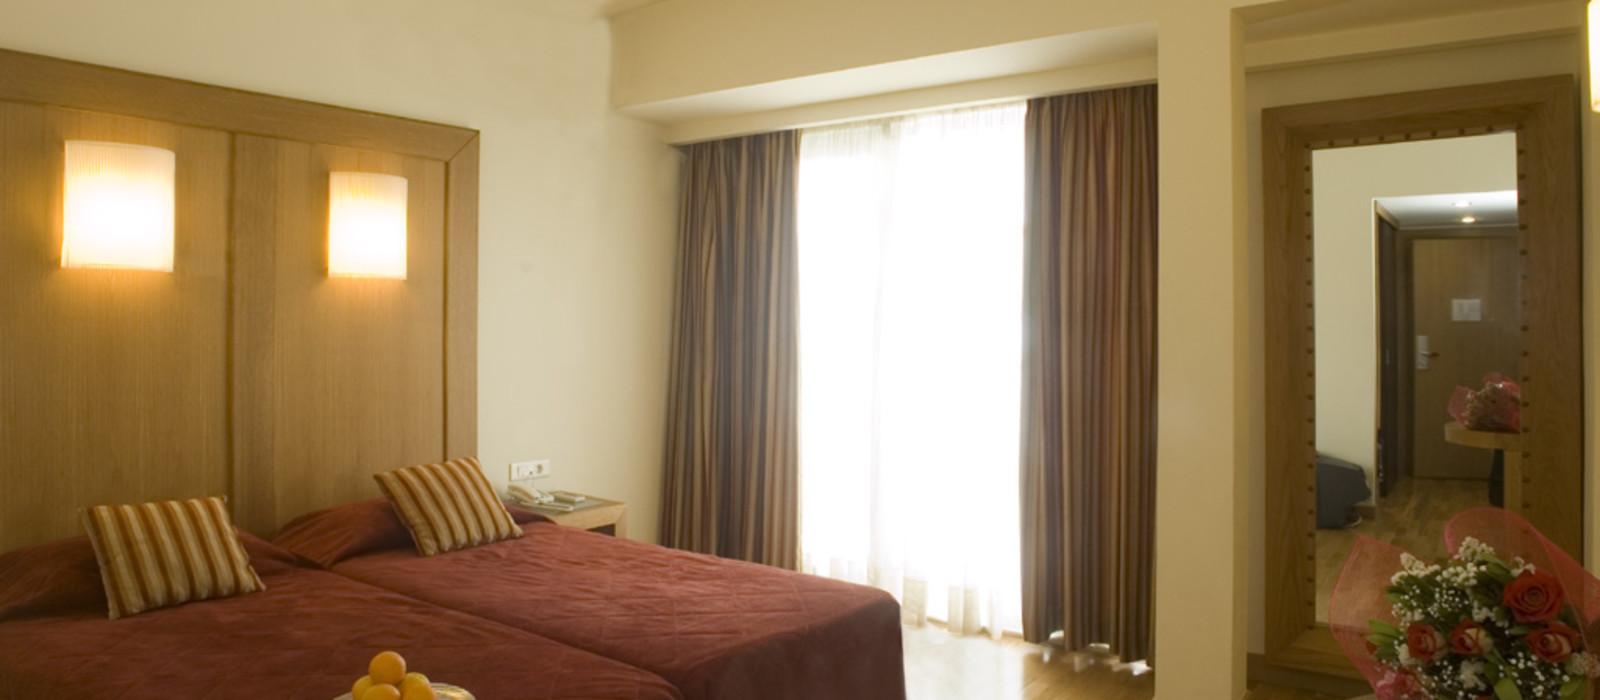 Hotel Hermes  Griechenland